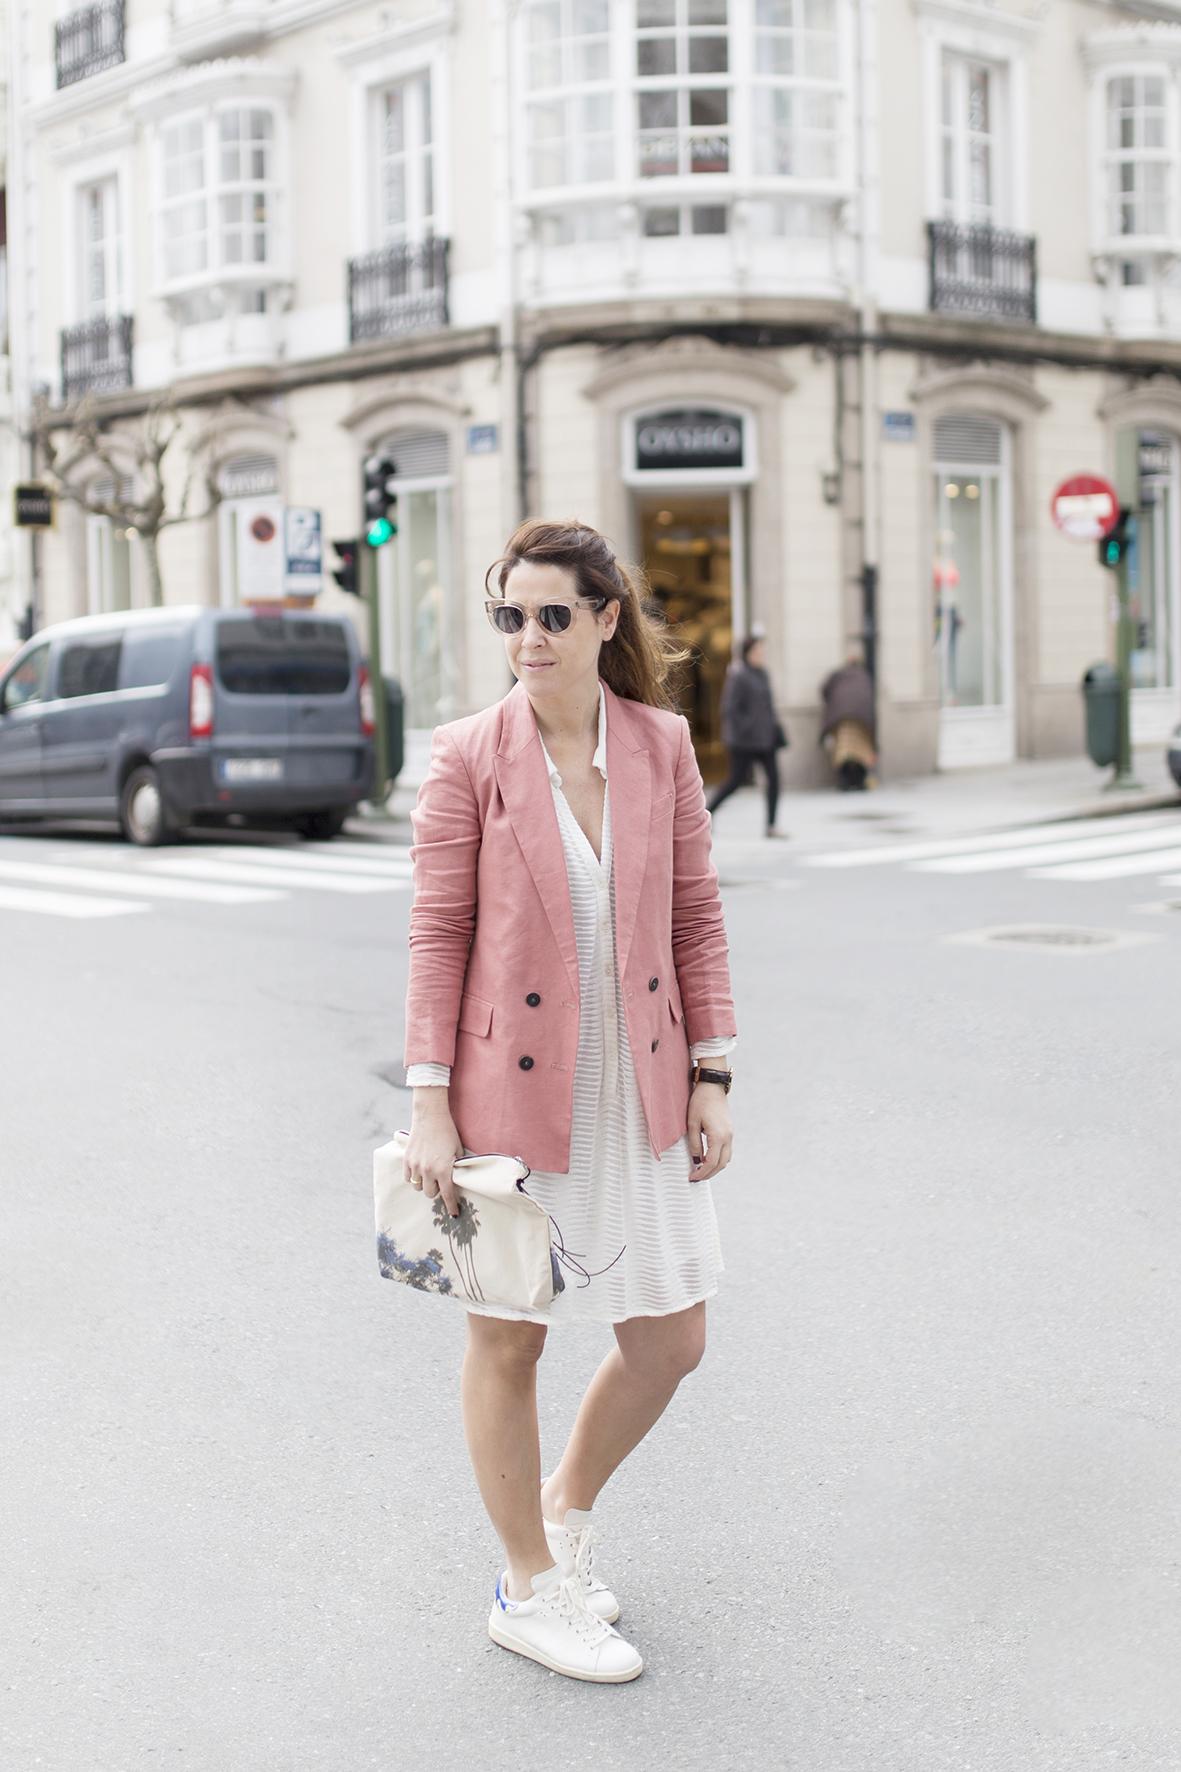 cèline sunglasses-fashion- Coruña-Voglia-streetstye-descalzaporelparque-Silver Lake Zubi-Mango blazer